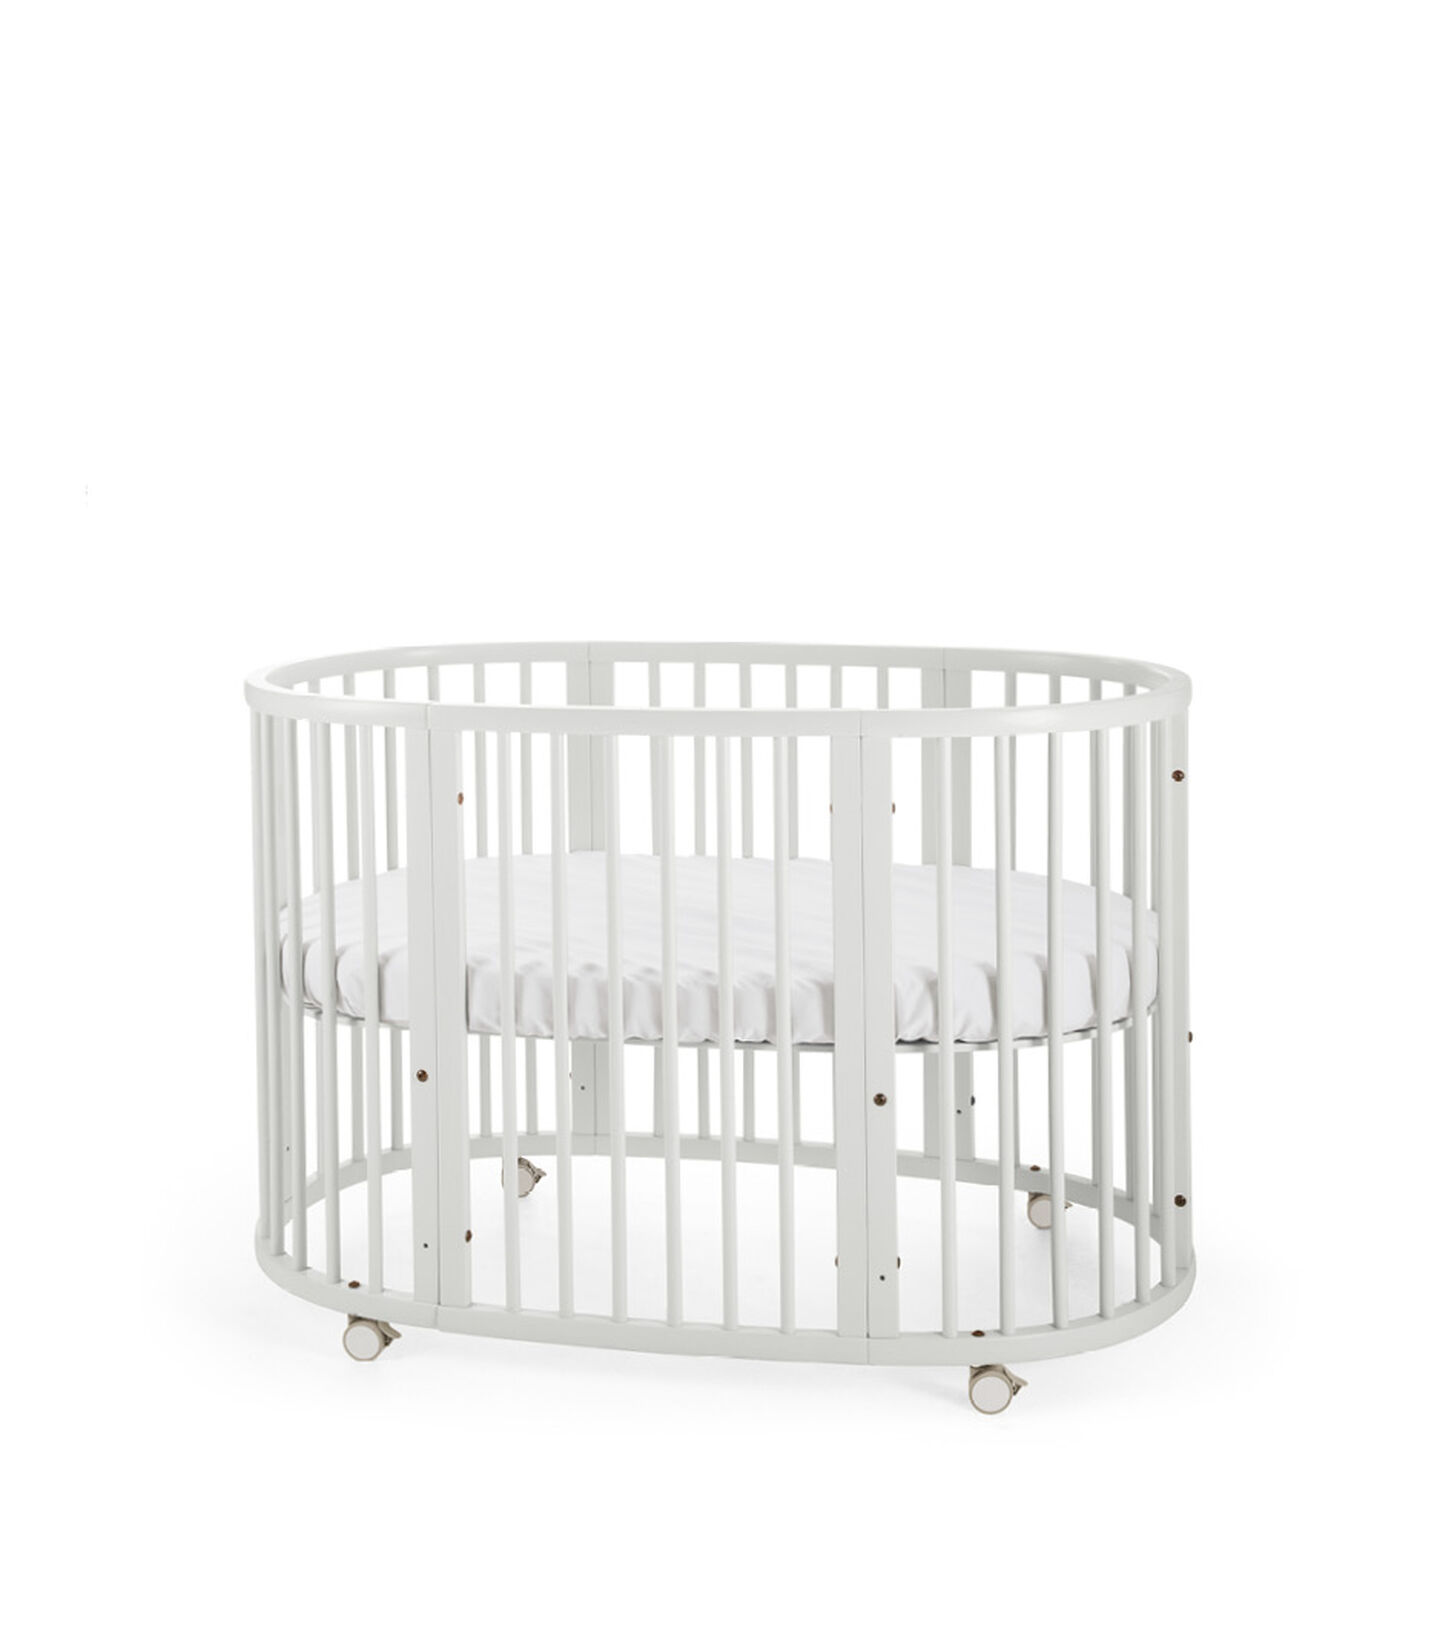 Stokke® Sleepi™ Bett White, White, mainview view 1